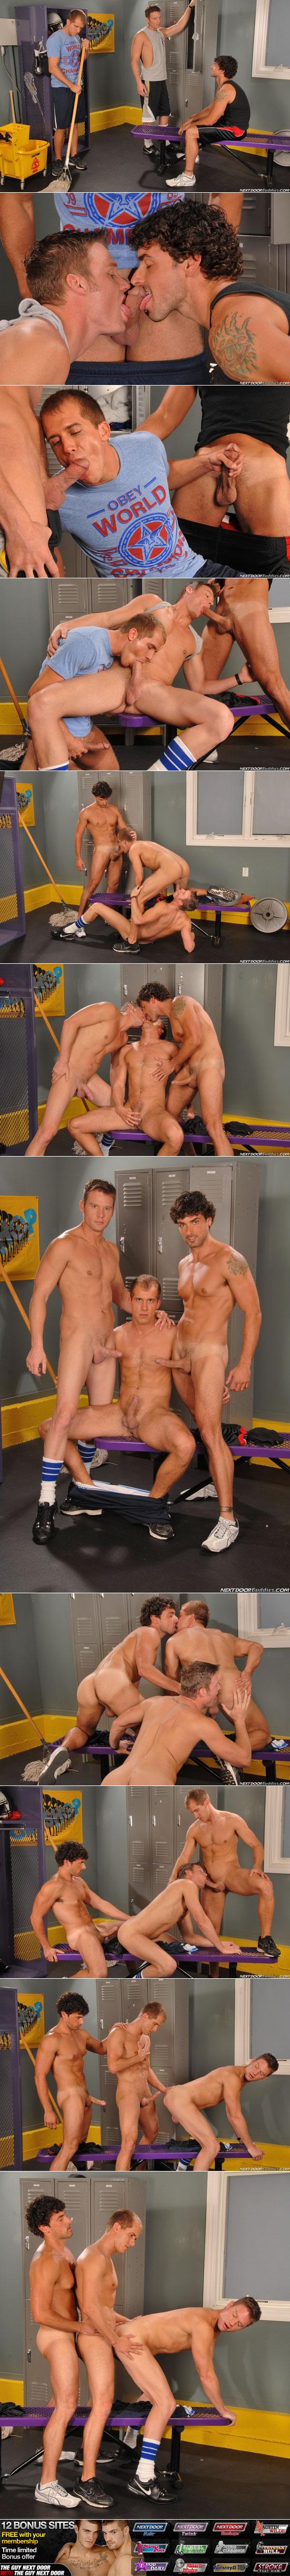 Steven Daigle, Brandon Lewis and Jeremy Bilding